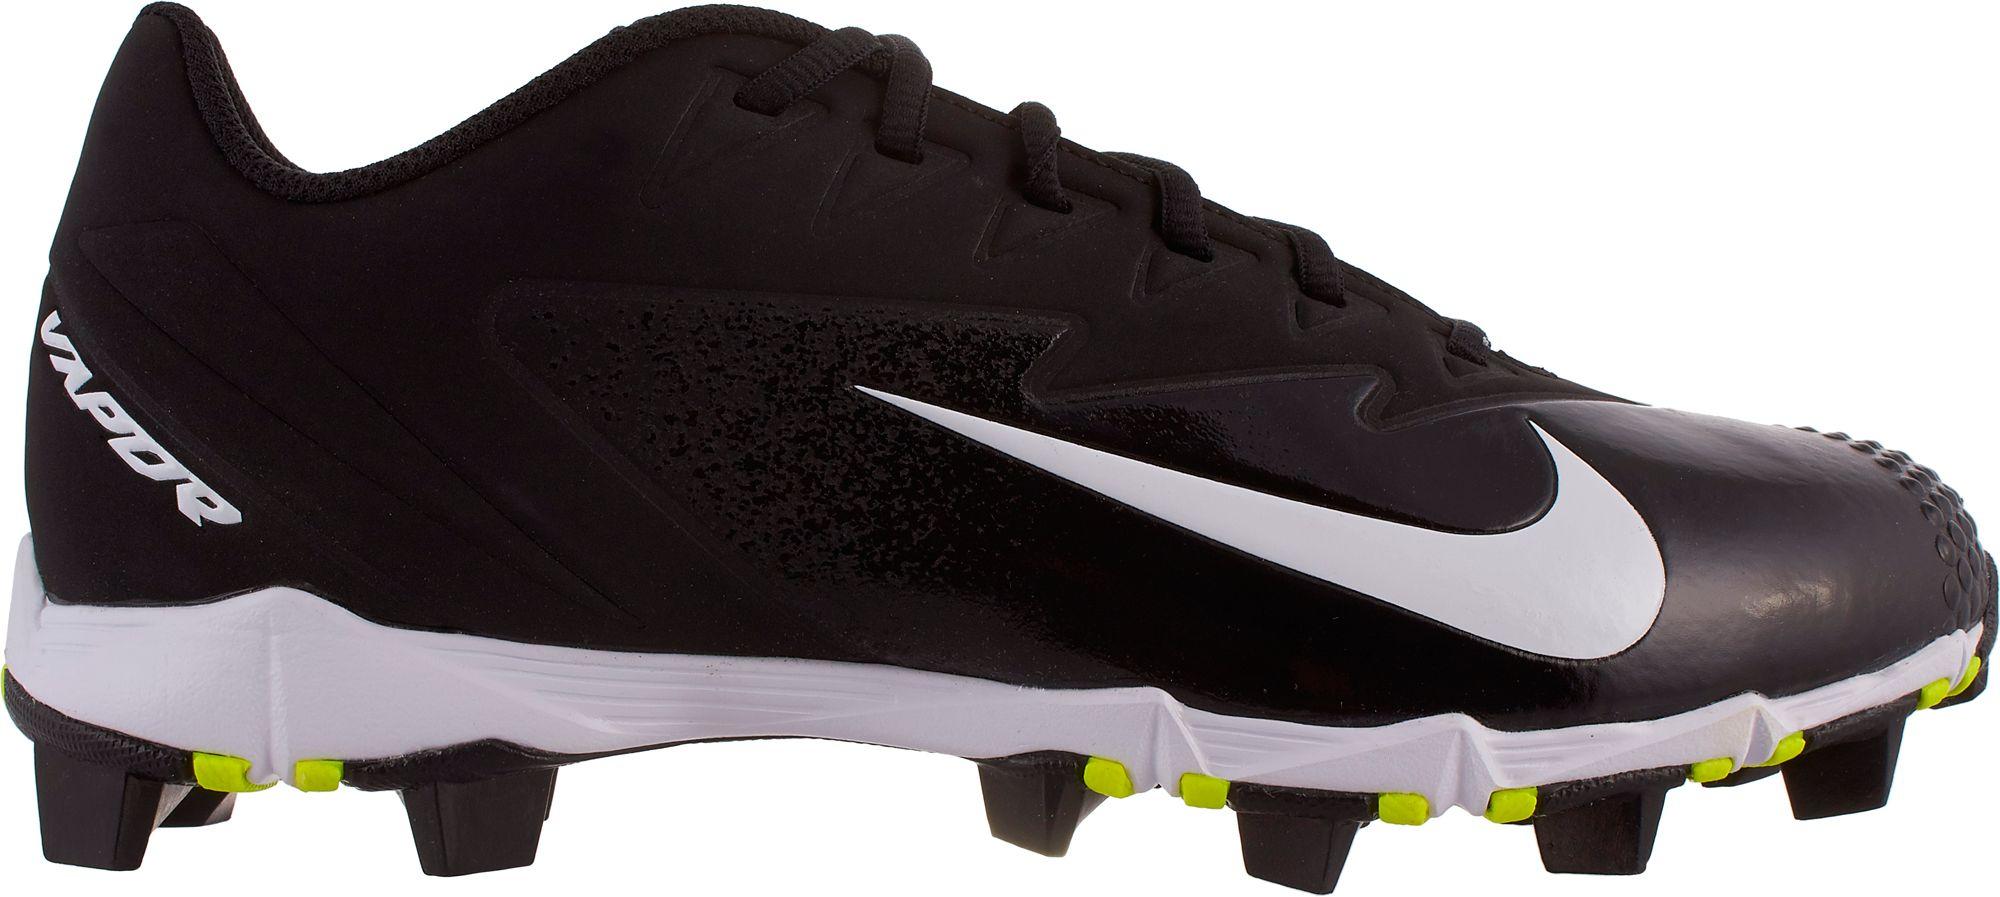 Nike Vapor Ultrafly Keystone Outlet Buy Cheap Latest Buy Cheap For Sale Cheap Browse Buy Cheap Ebay 4ttf1